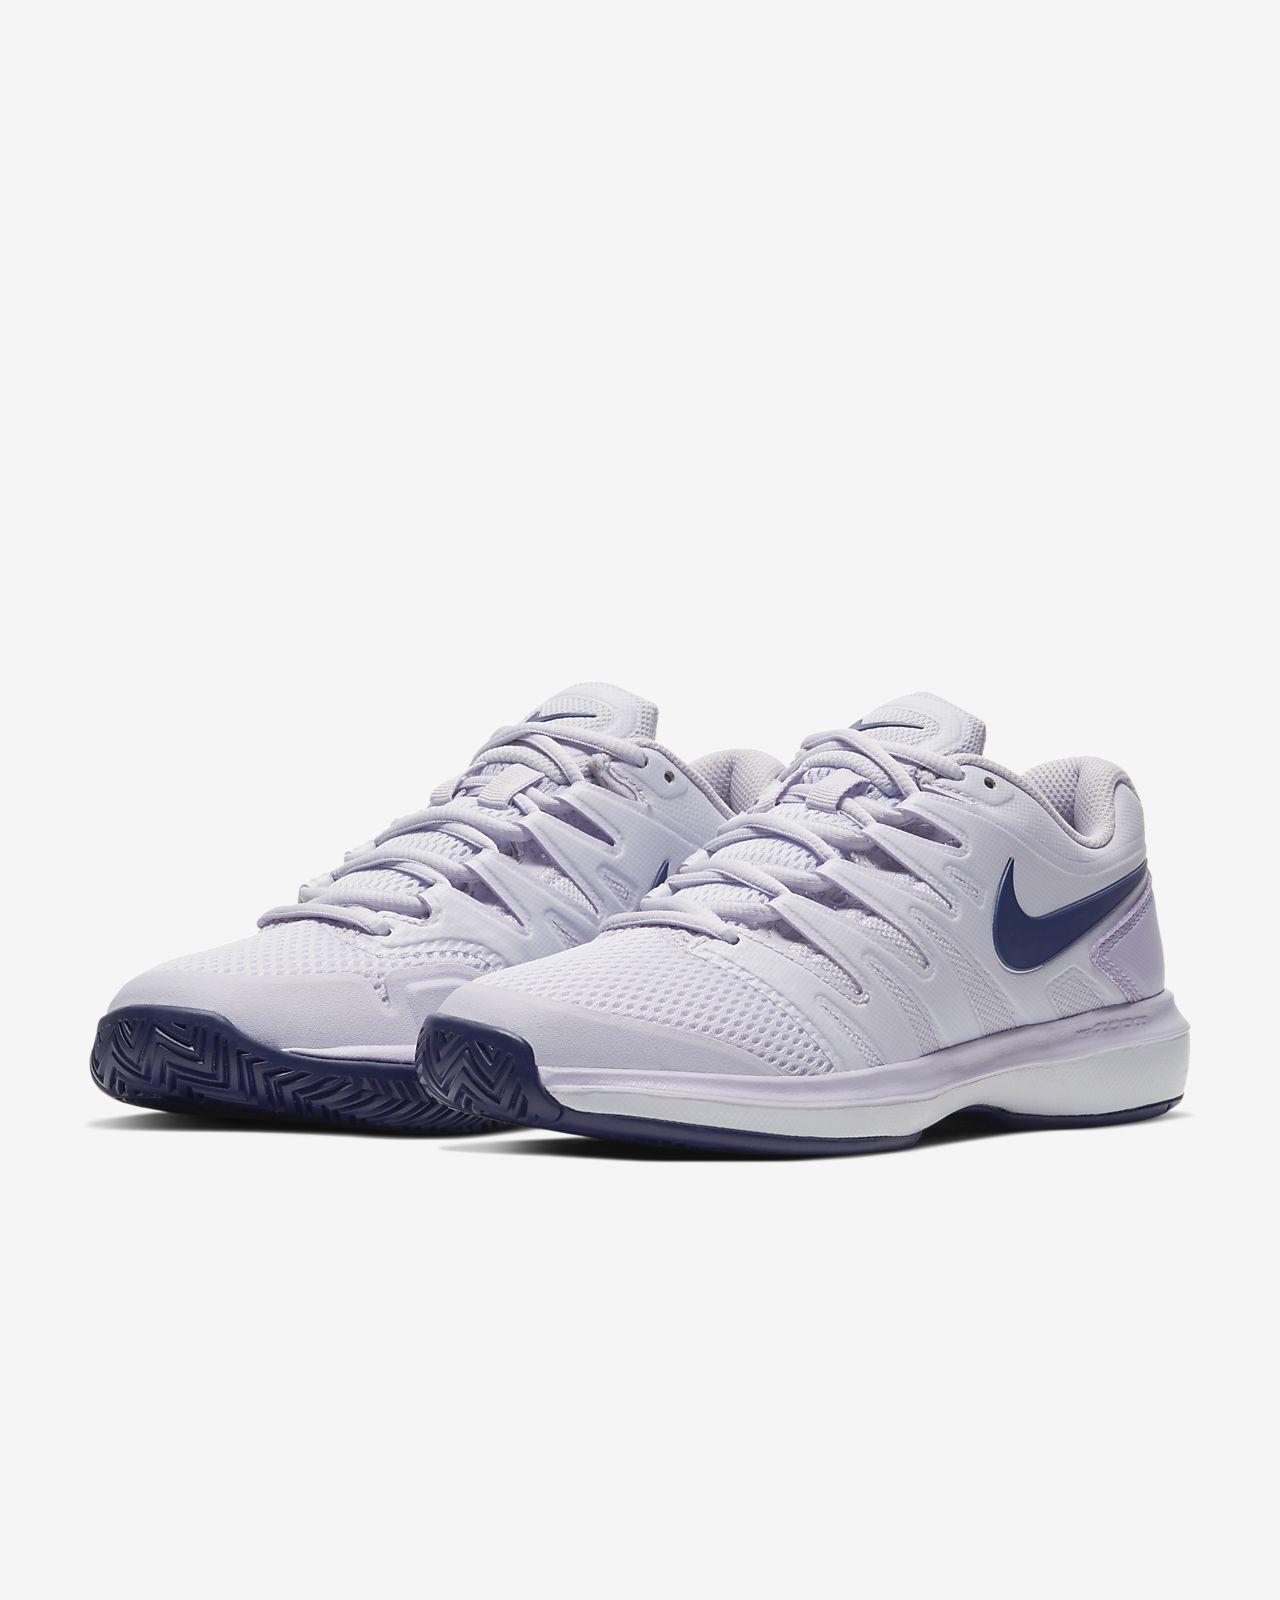 Novo Sapatilhas Tenis Pretas Branco Nike Air Zoom Prestige